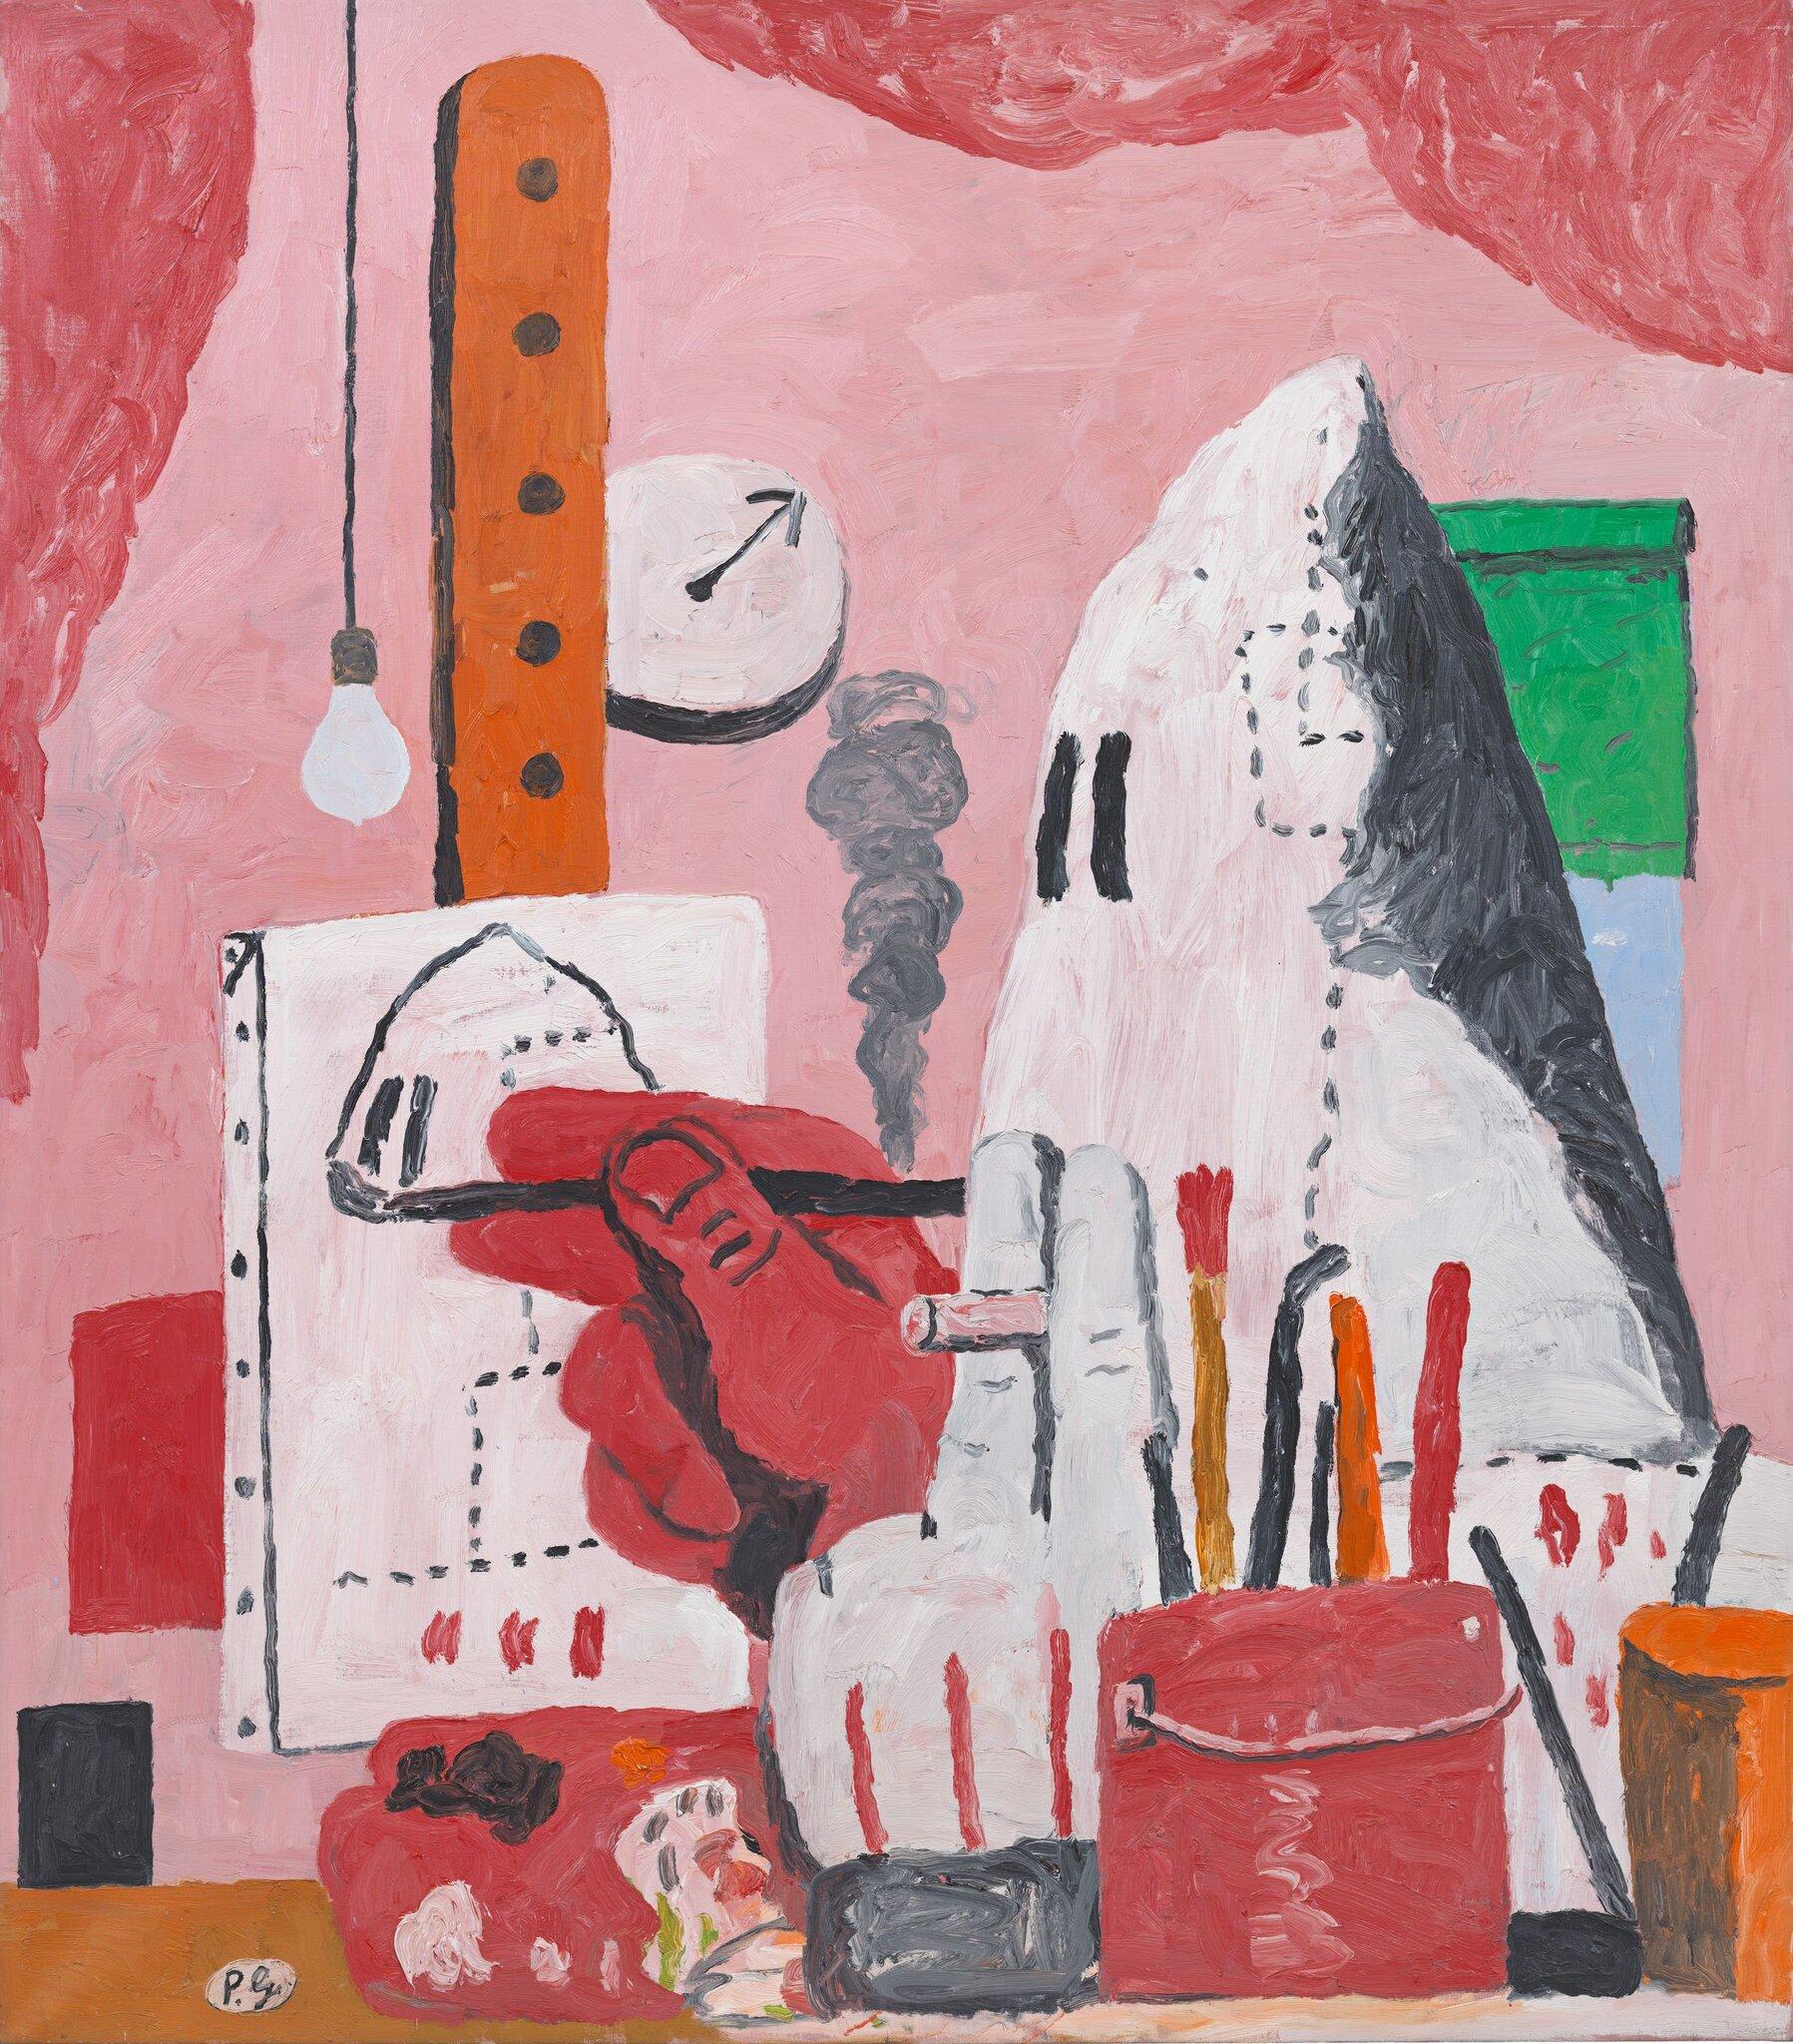 The Studio, 1969, by Philip Guston. © The Estate of Philip Guston.